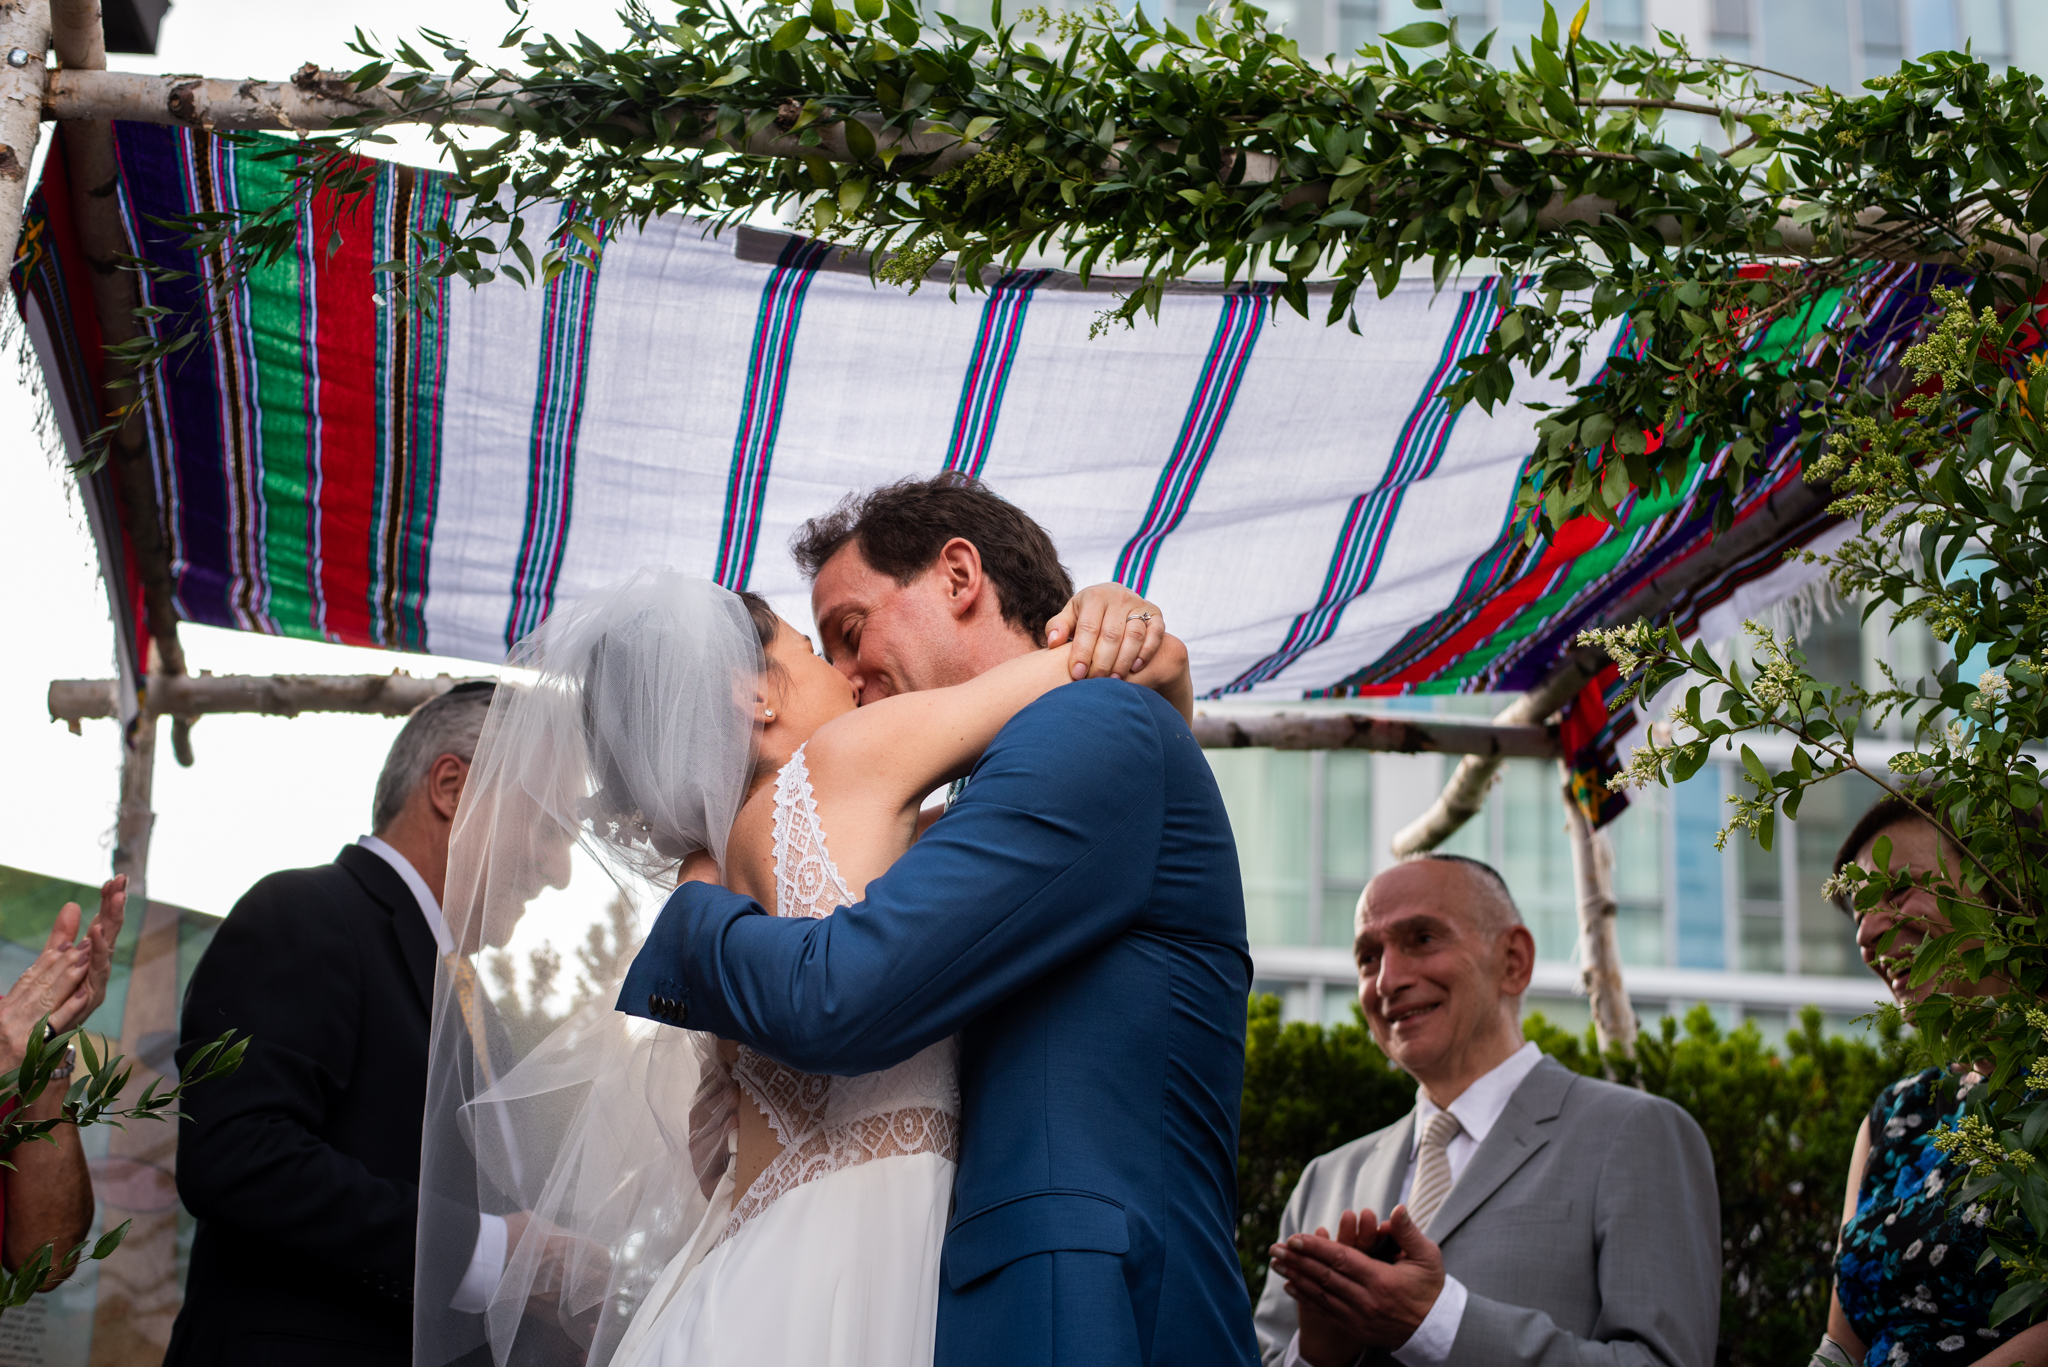 Keren & Jonathan's Wedding by Romina Hendlin @TheOtherRomina-013.jpg